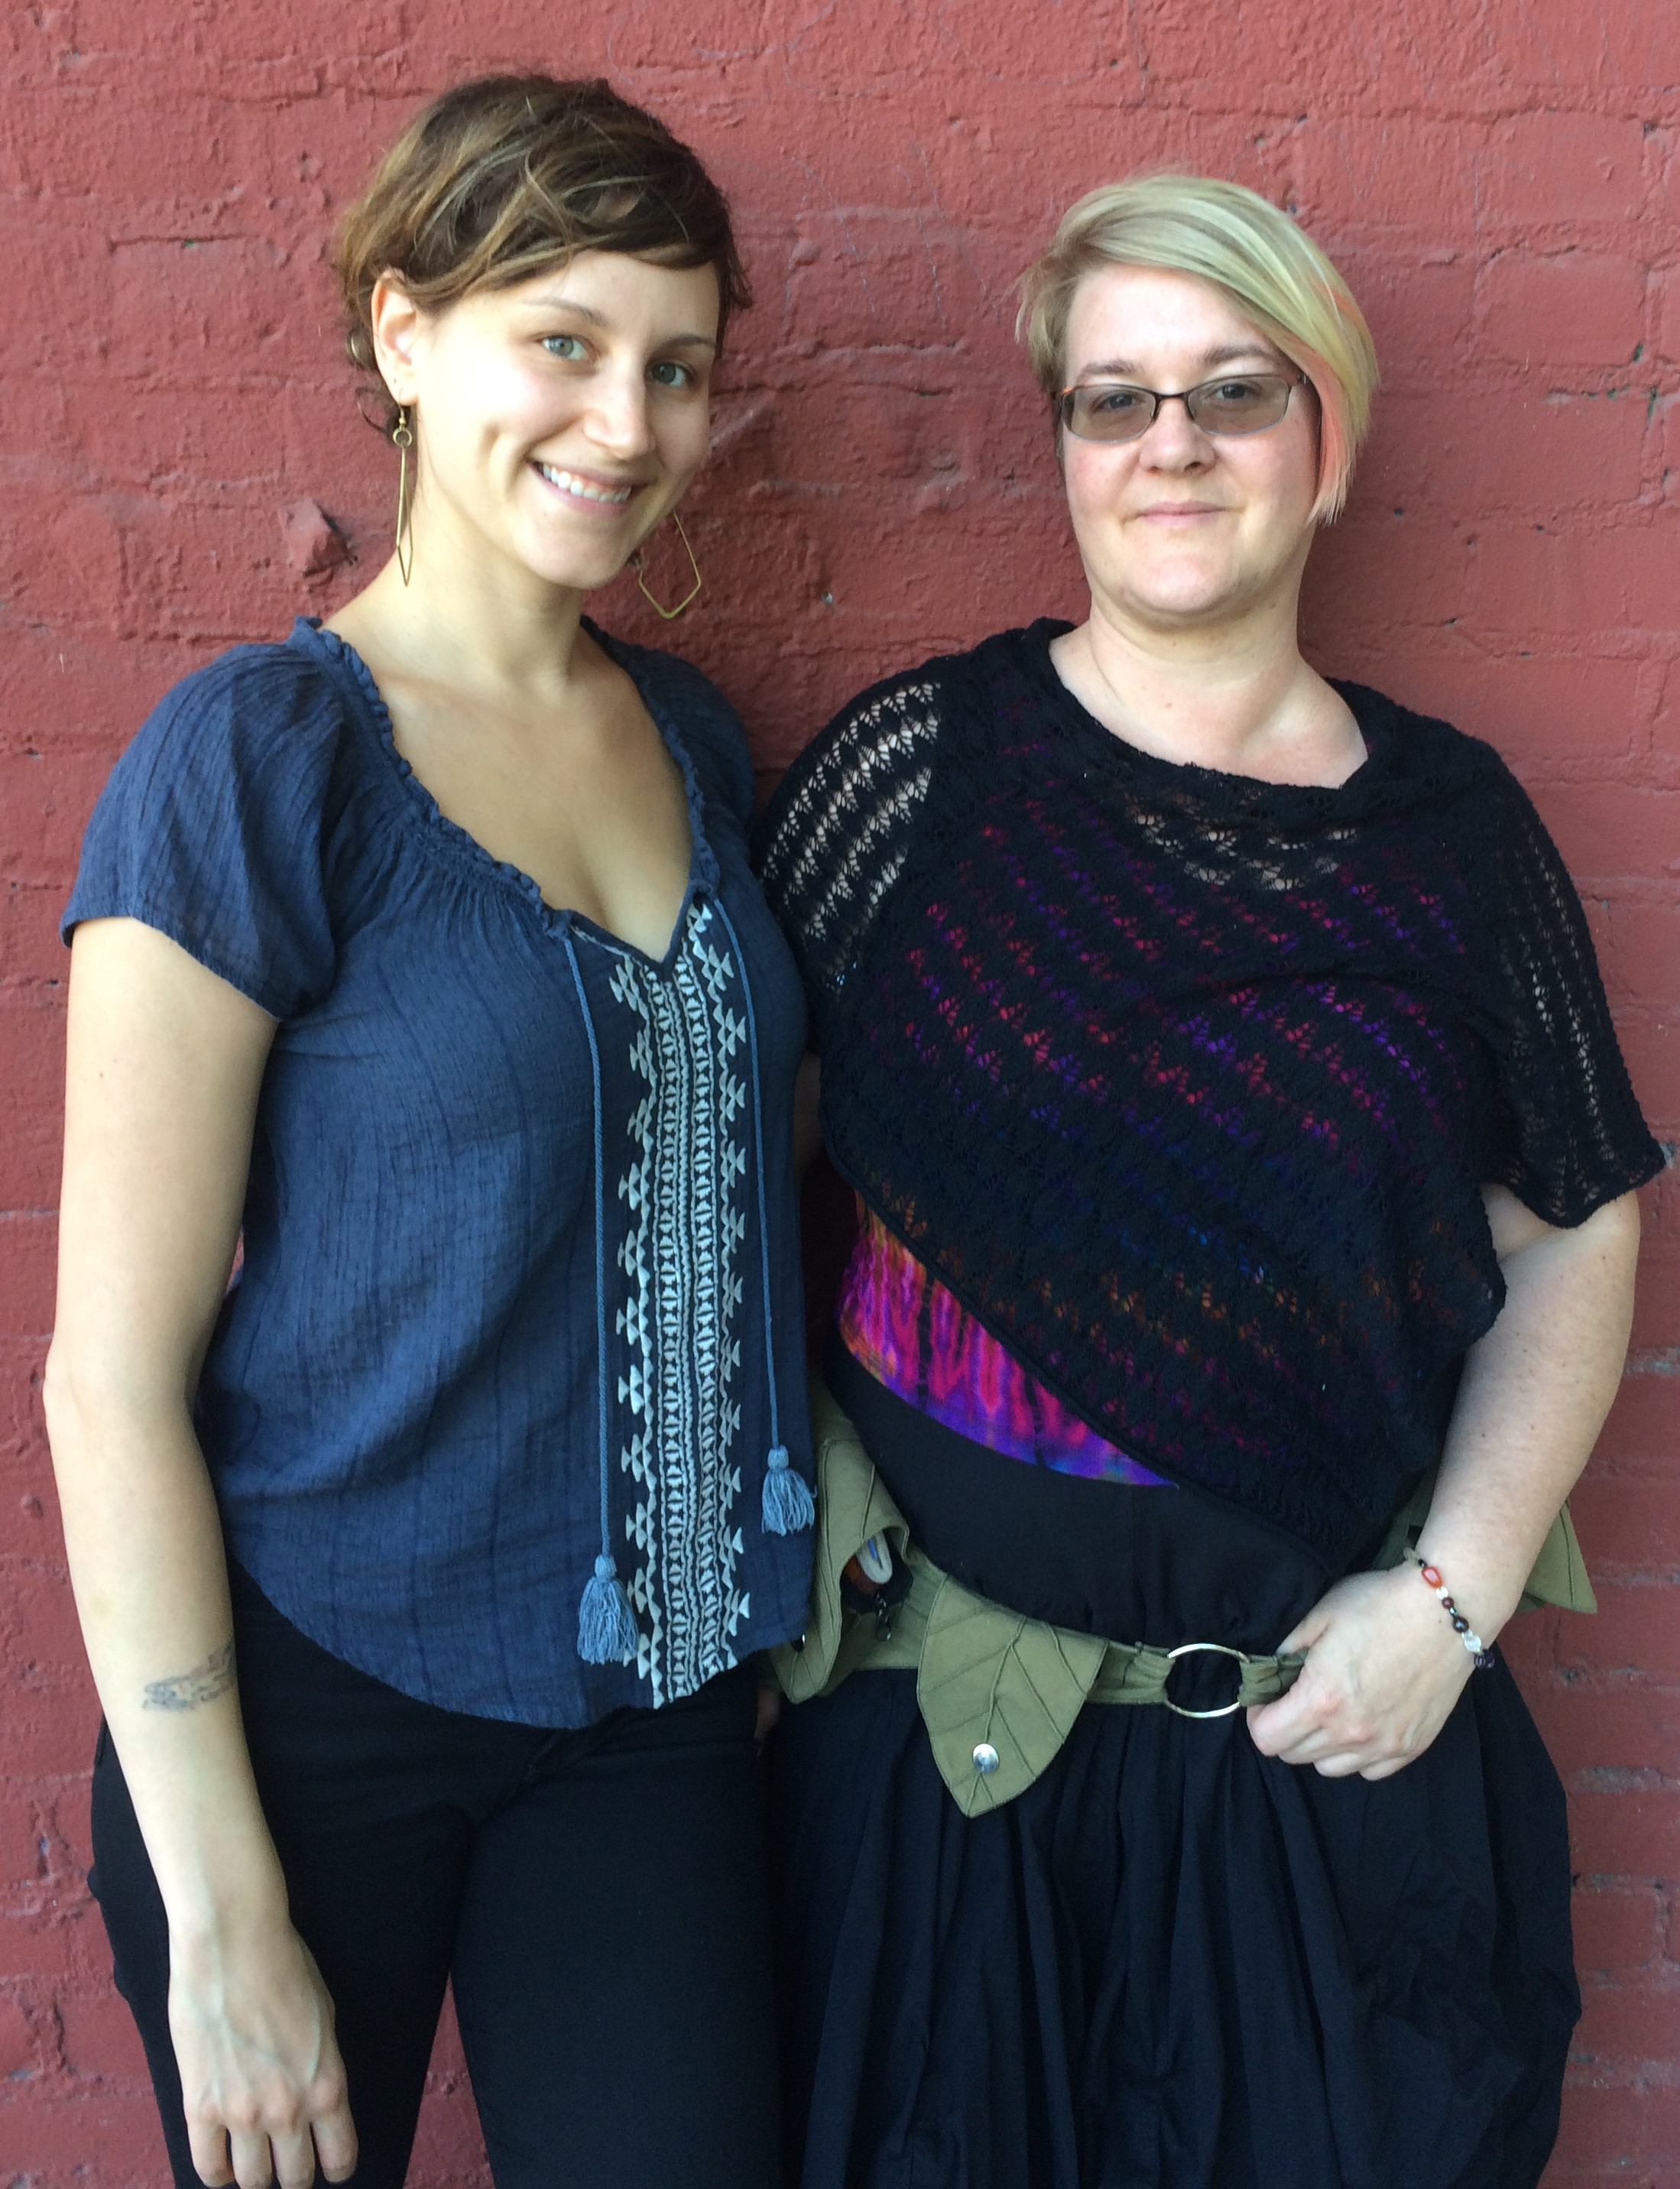 Halley Miglietta (left) and Michaela at Halley's studio in The Urban Hive, Sacramento.